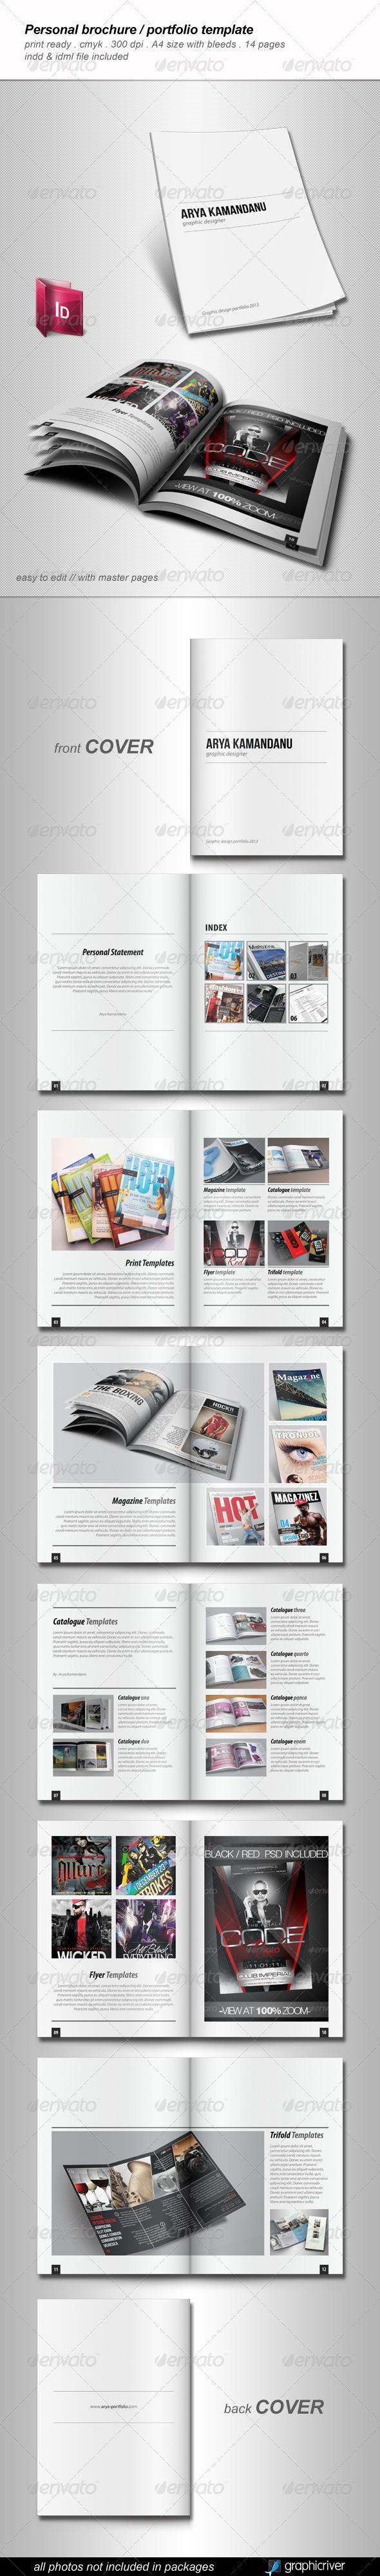 Personal Brochure / Portfolio Template - Portfolio Brochures